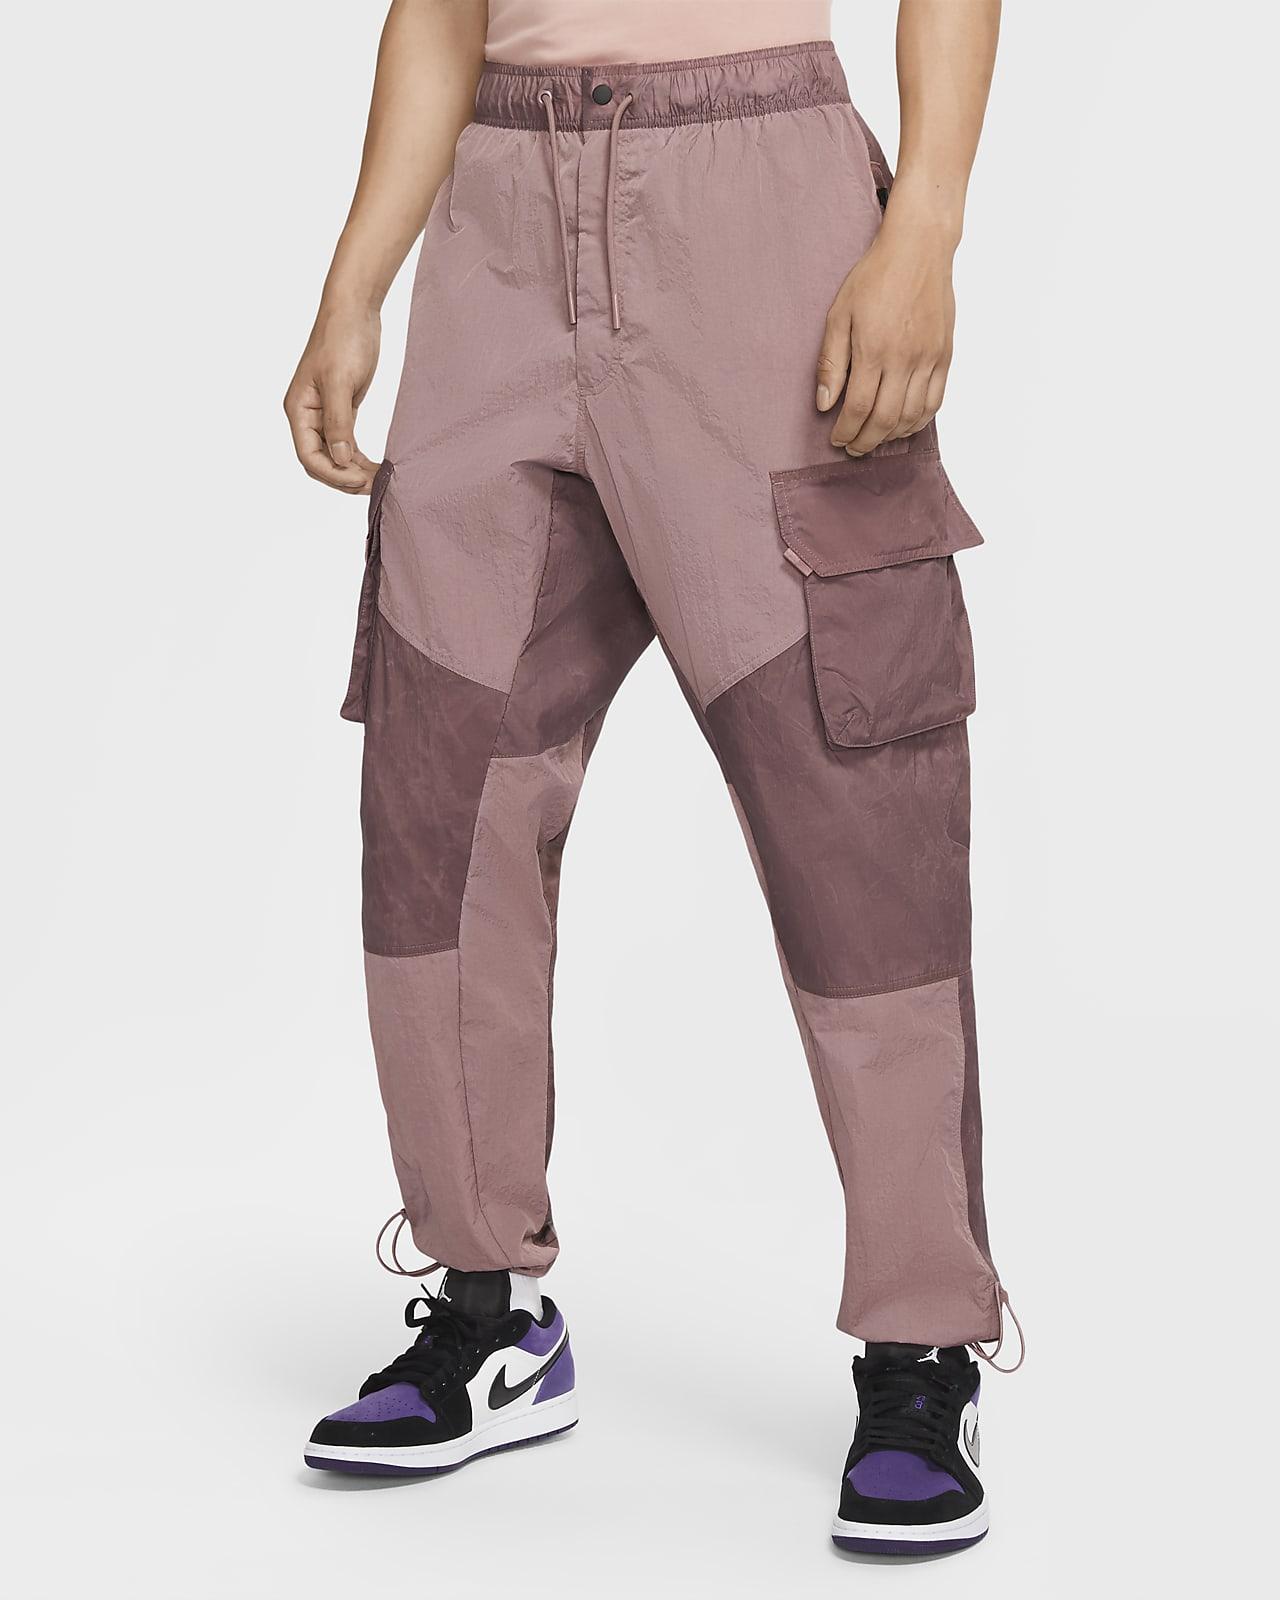 Pantalones cargo para hombre Jordan 23 Engineered. Nike.com